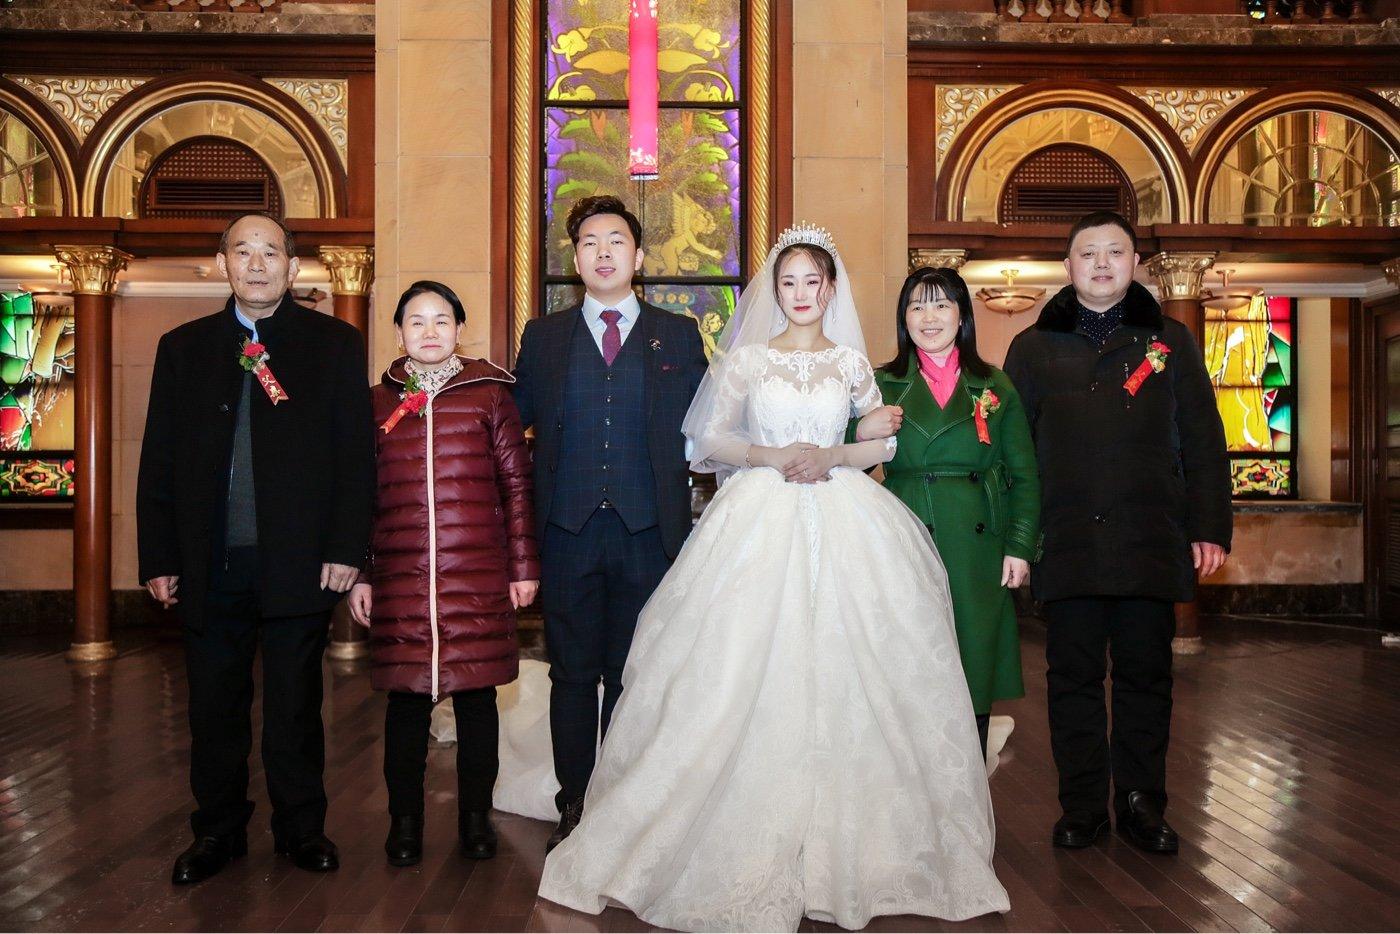 「Fantasy Wedding」&明珠教堂⛪2